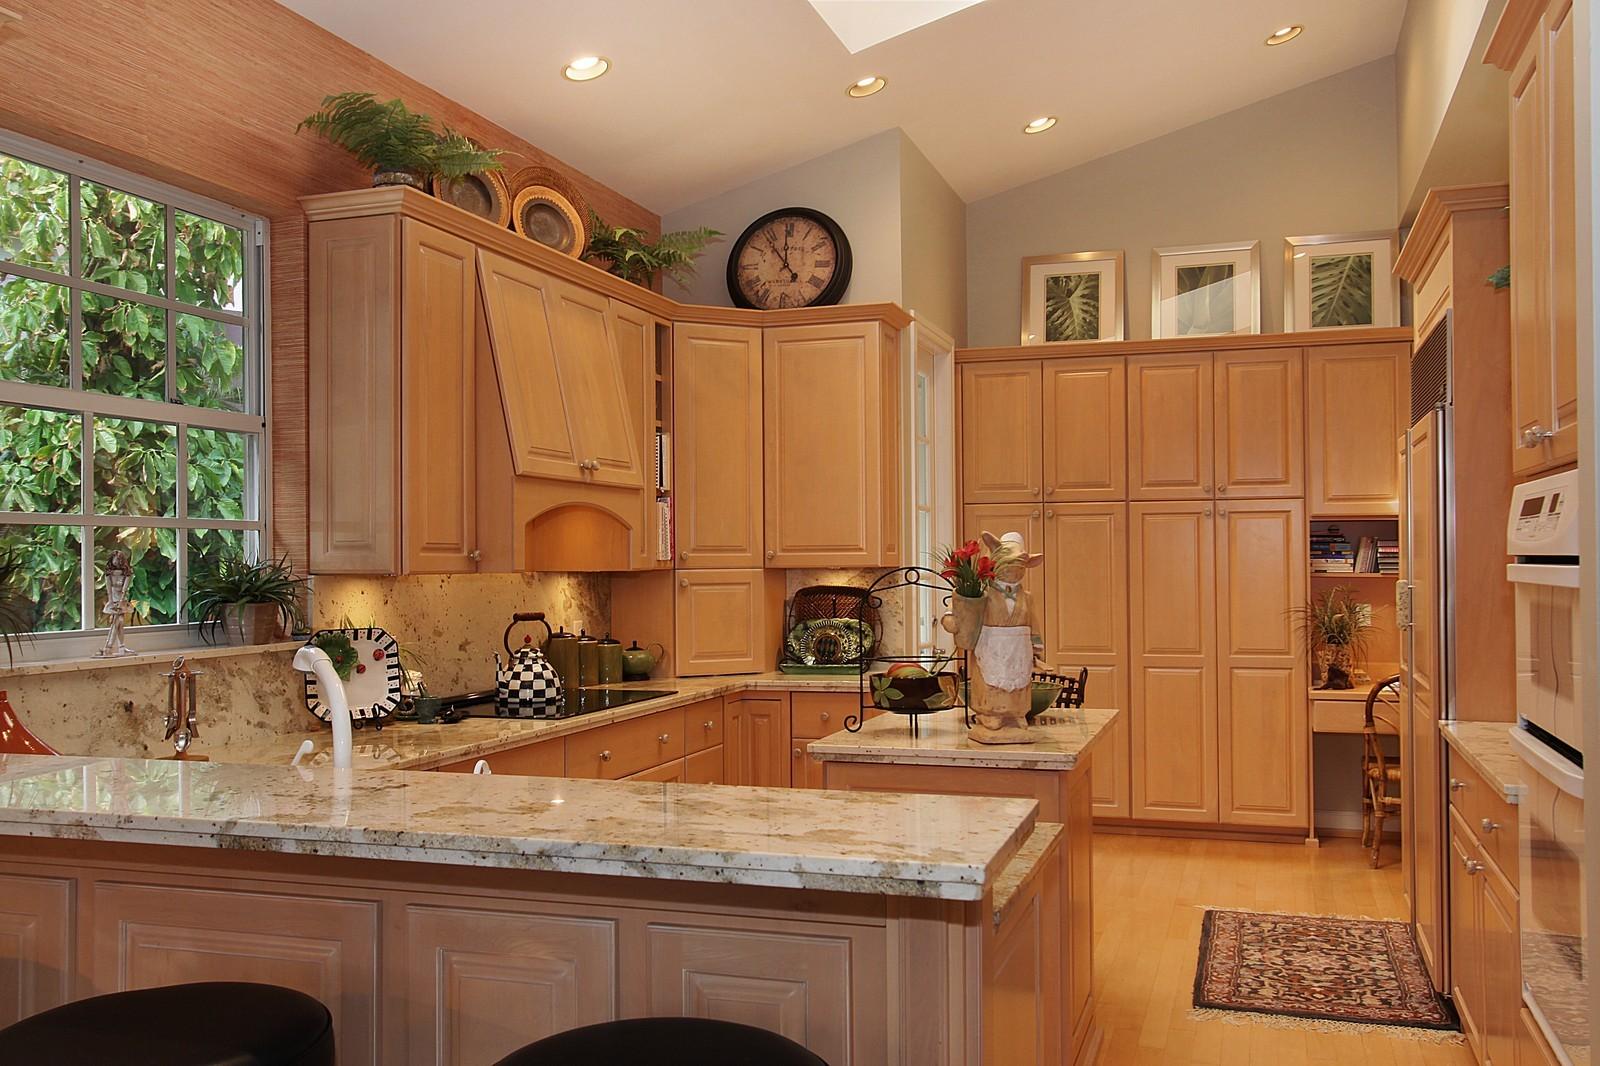 Real Estate Photography - 6930 SE Lakeview Ter, Stuart, FL, 34996 - Kitchen